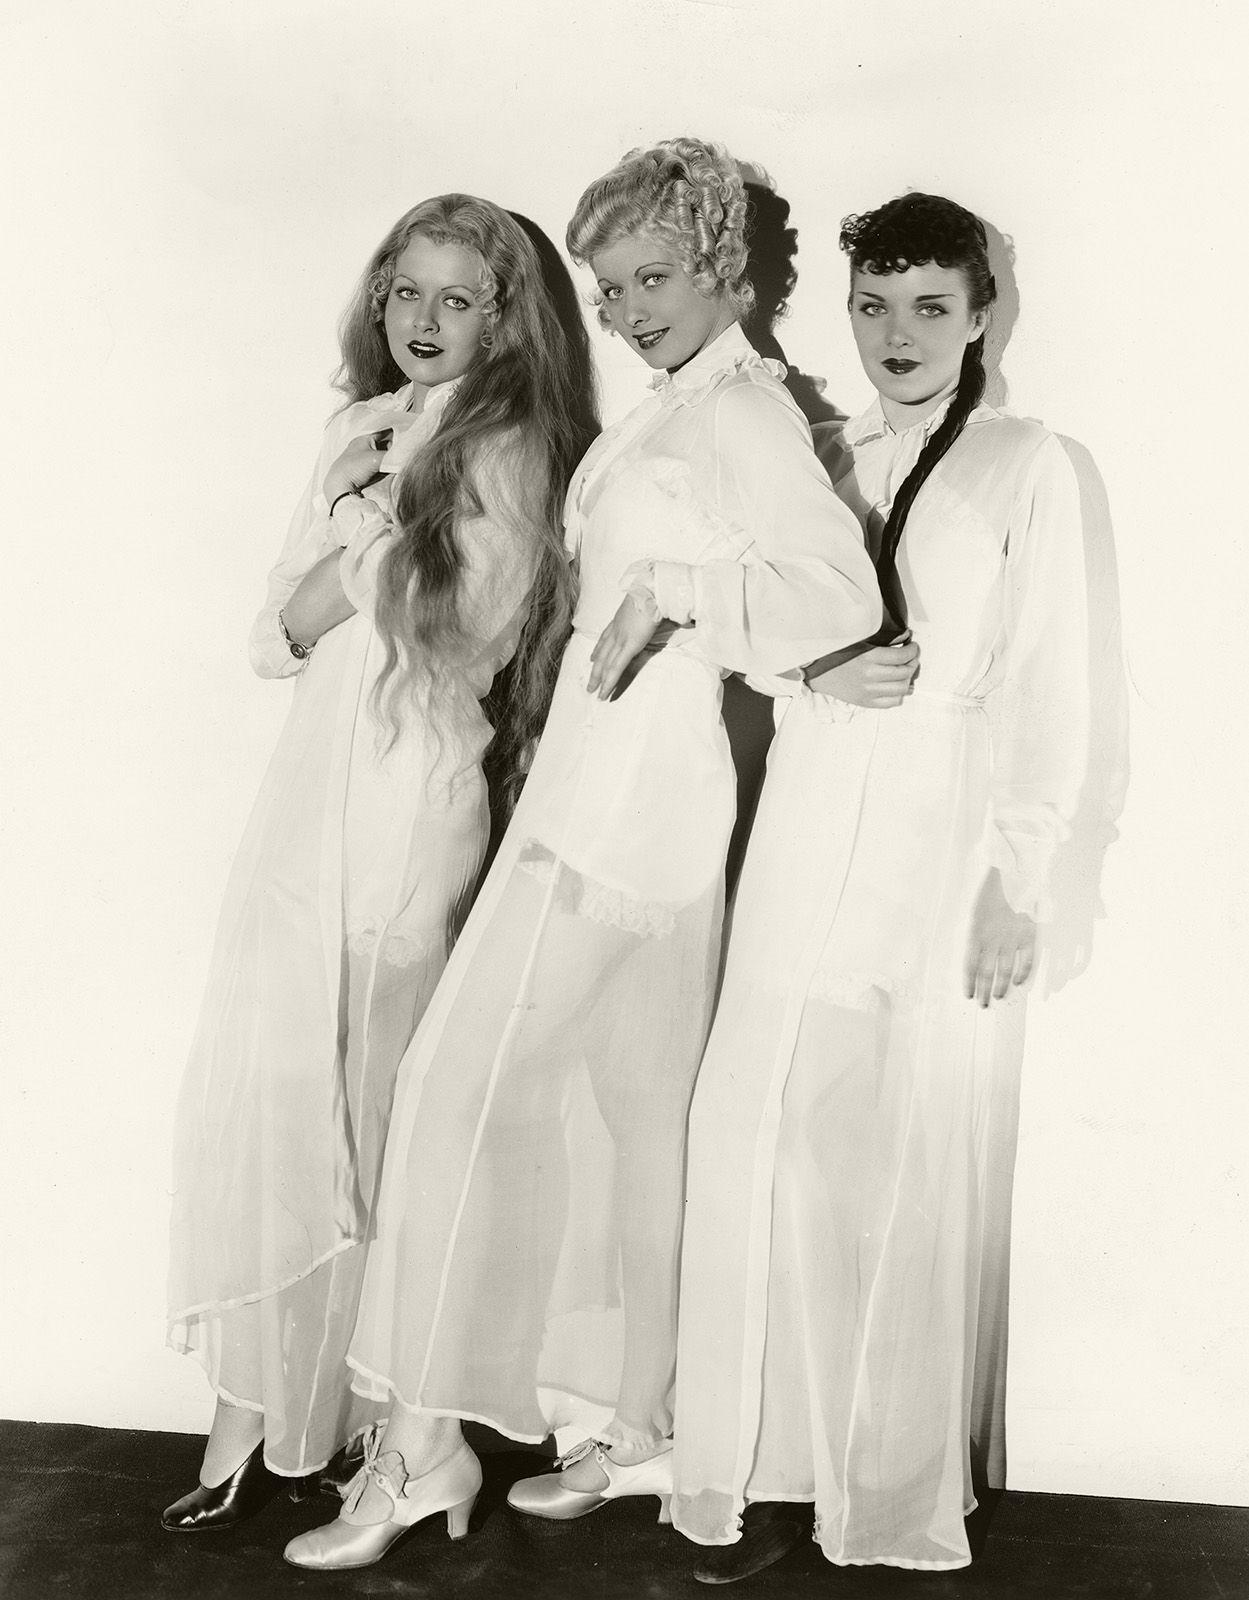 Manilyn Reynes (b. 1972),Dolores Palumbo Hot picture Abhirami,Sharon Hugueny